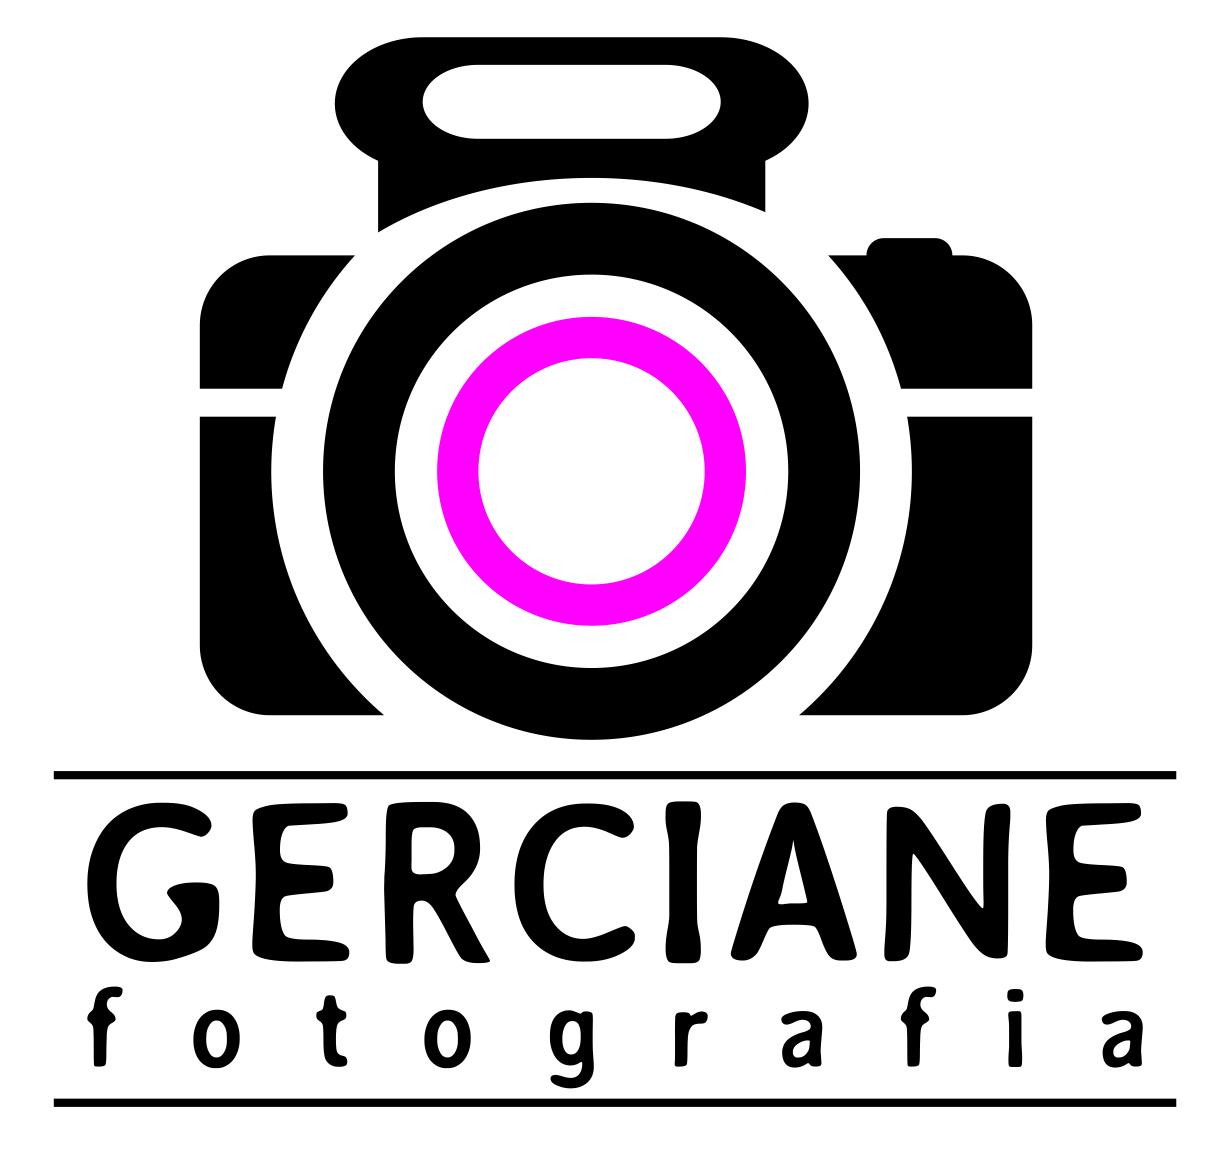 Gerciane Fotografia